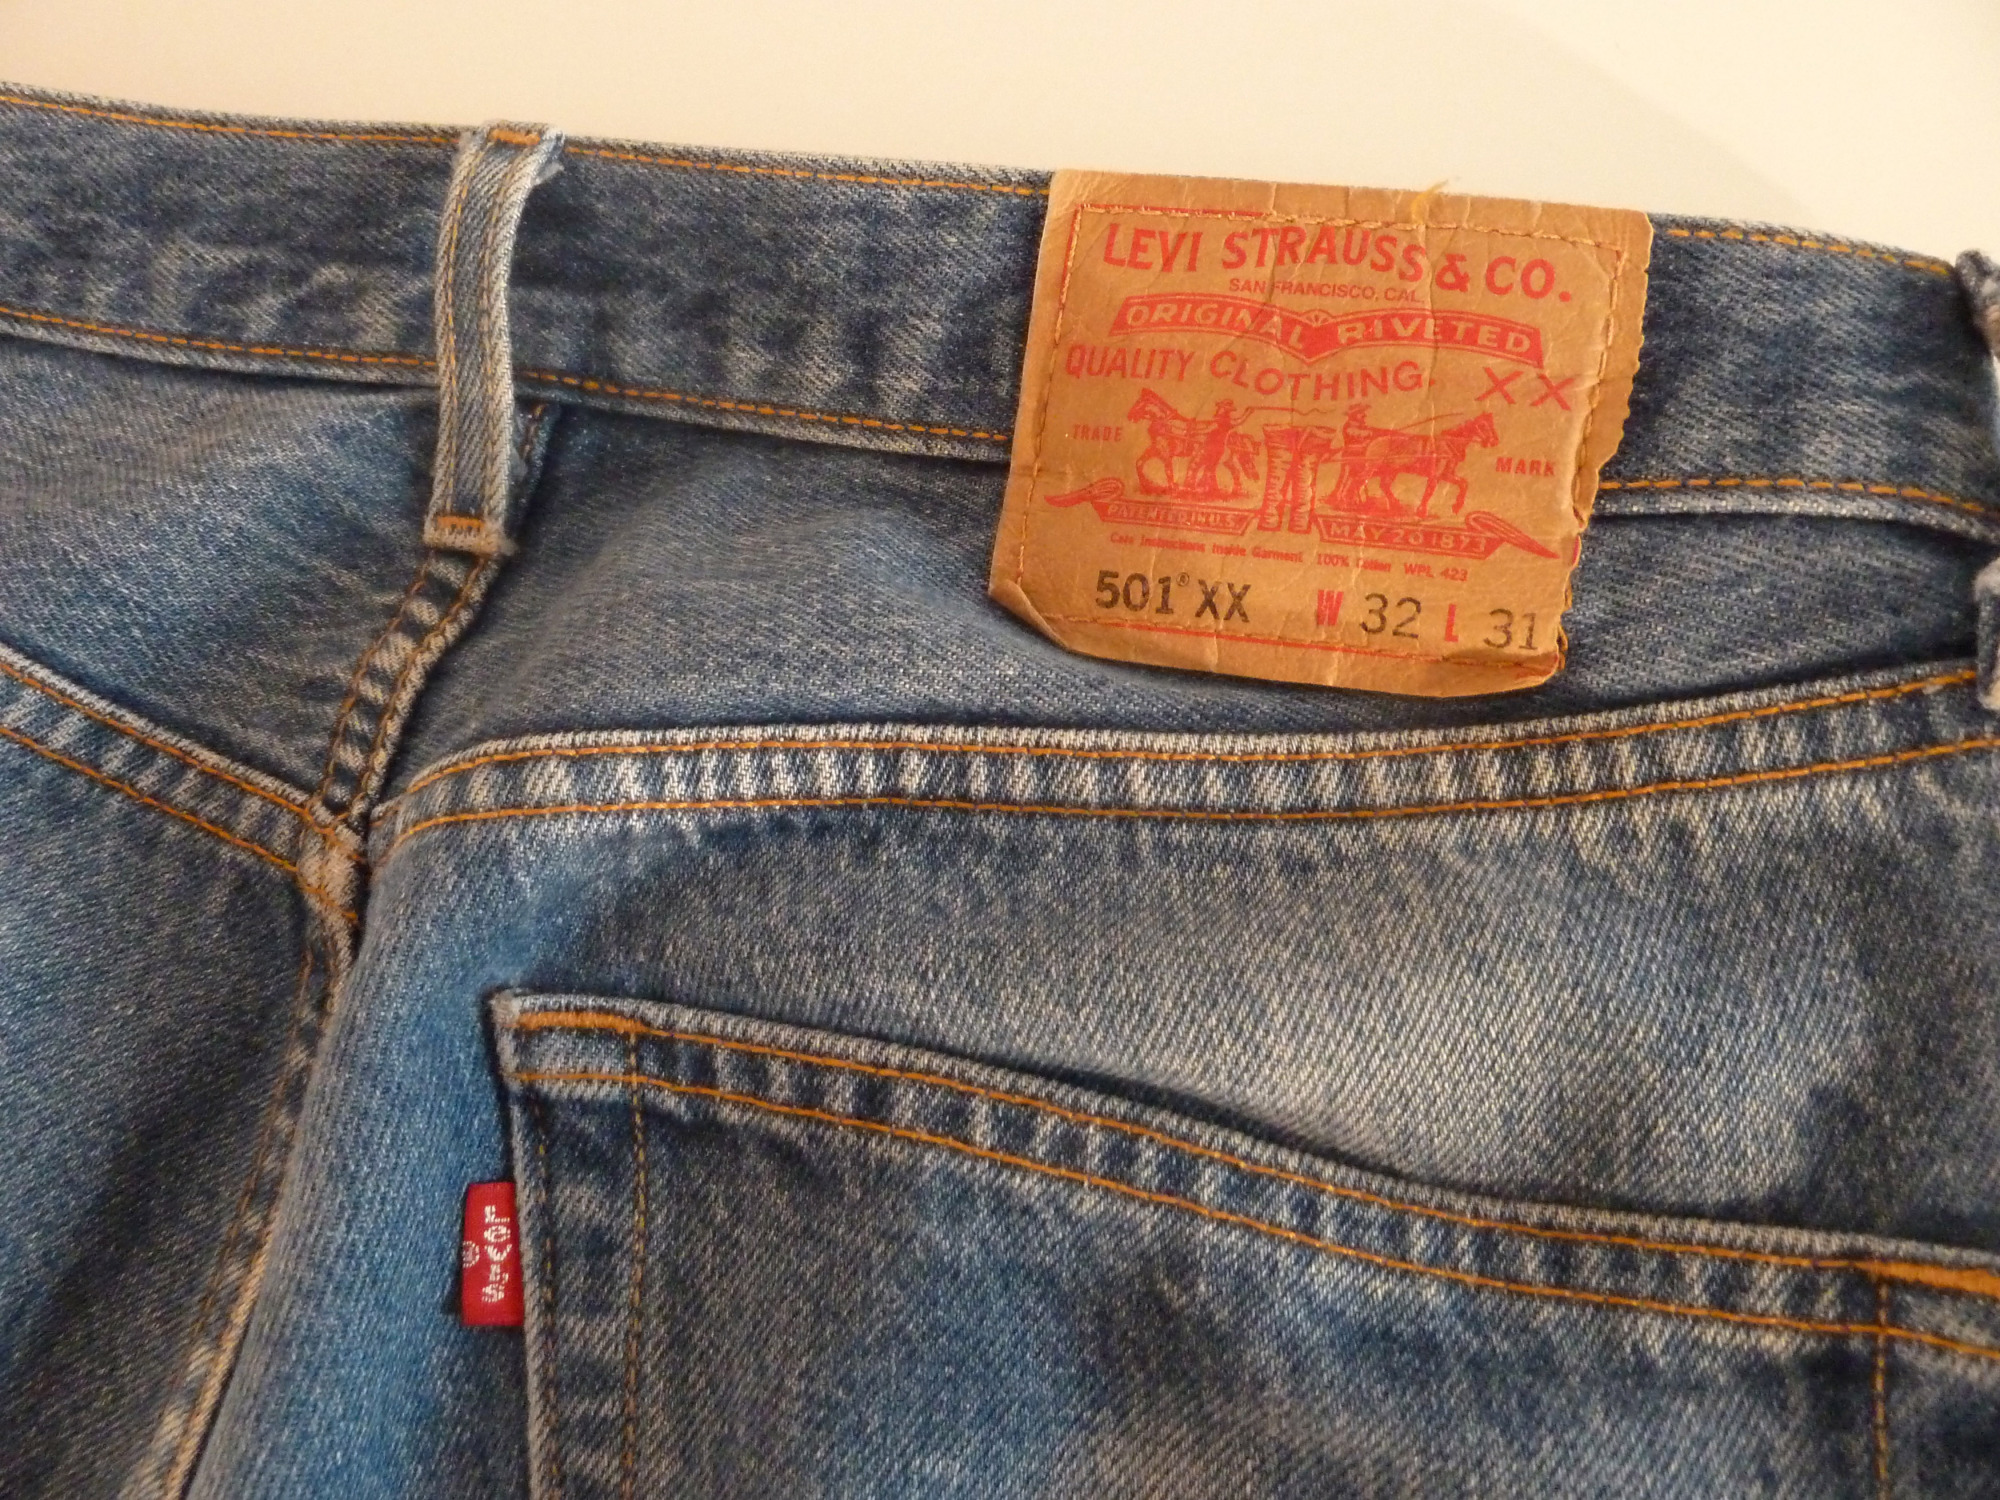 Levi's Store Activa 501 Vintage 2 Vintageusato Jeans vFxTwT